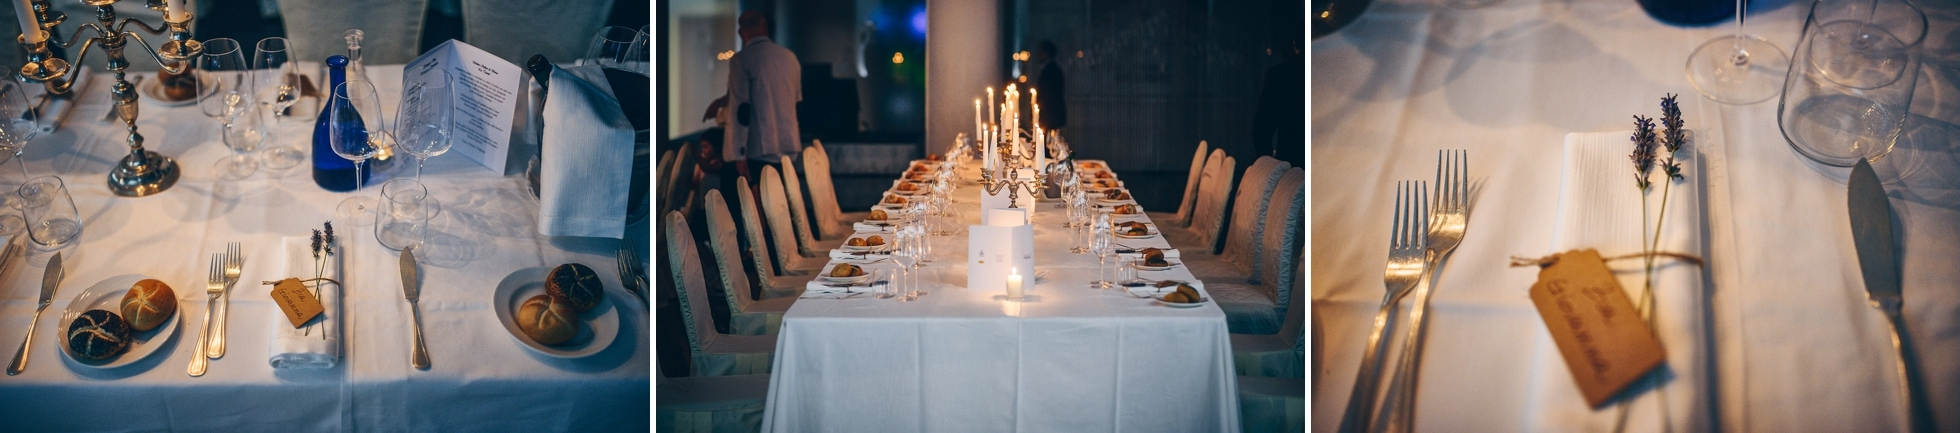 10 fotorgrafo matrimonio hotel giubileo potenza